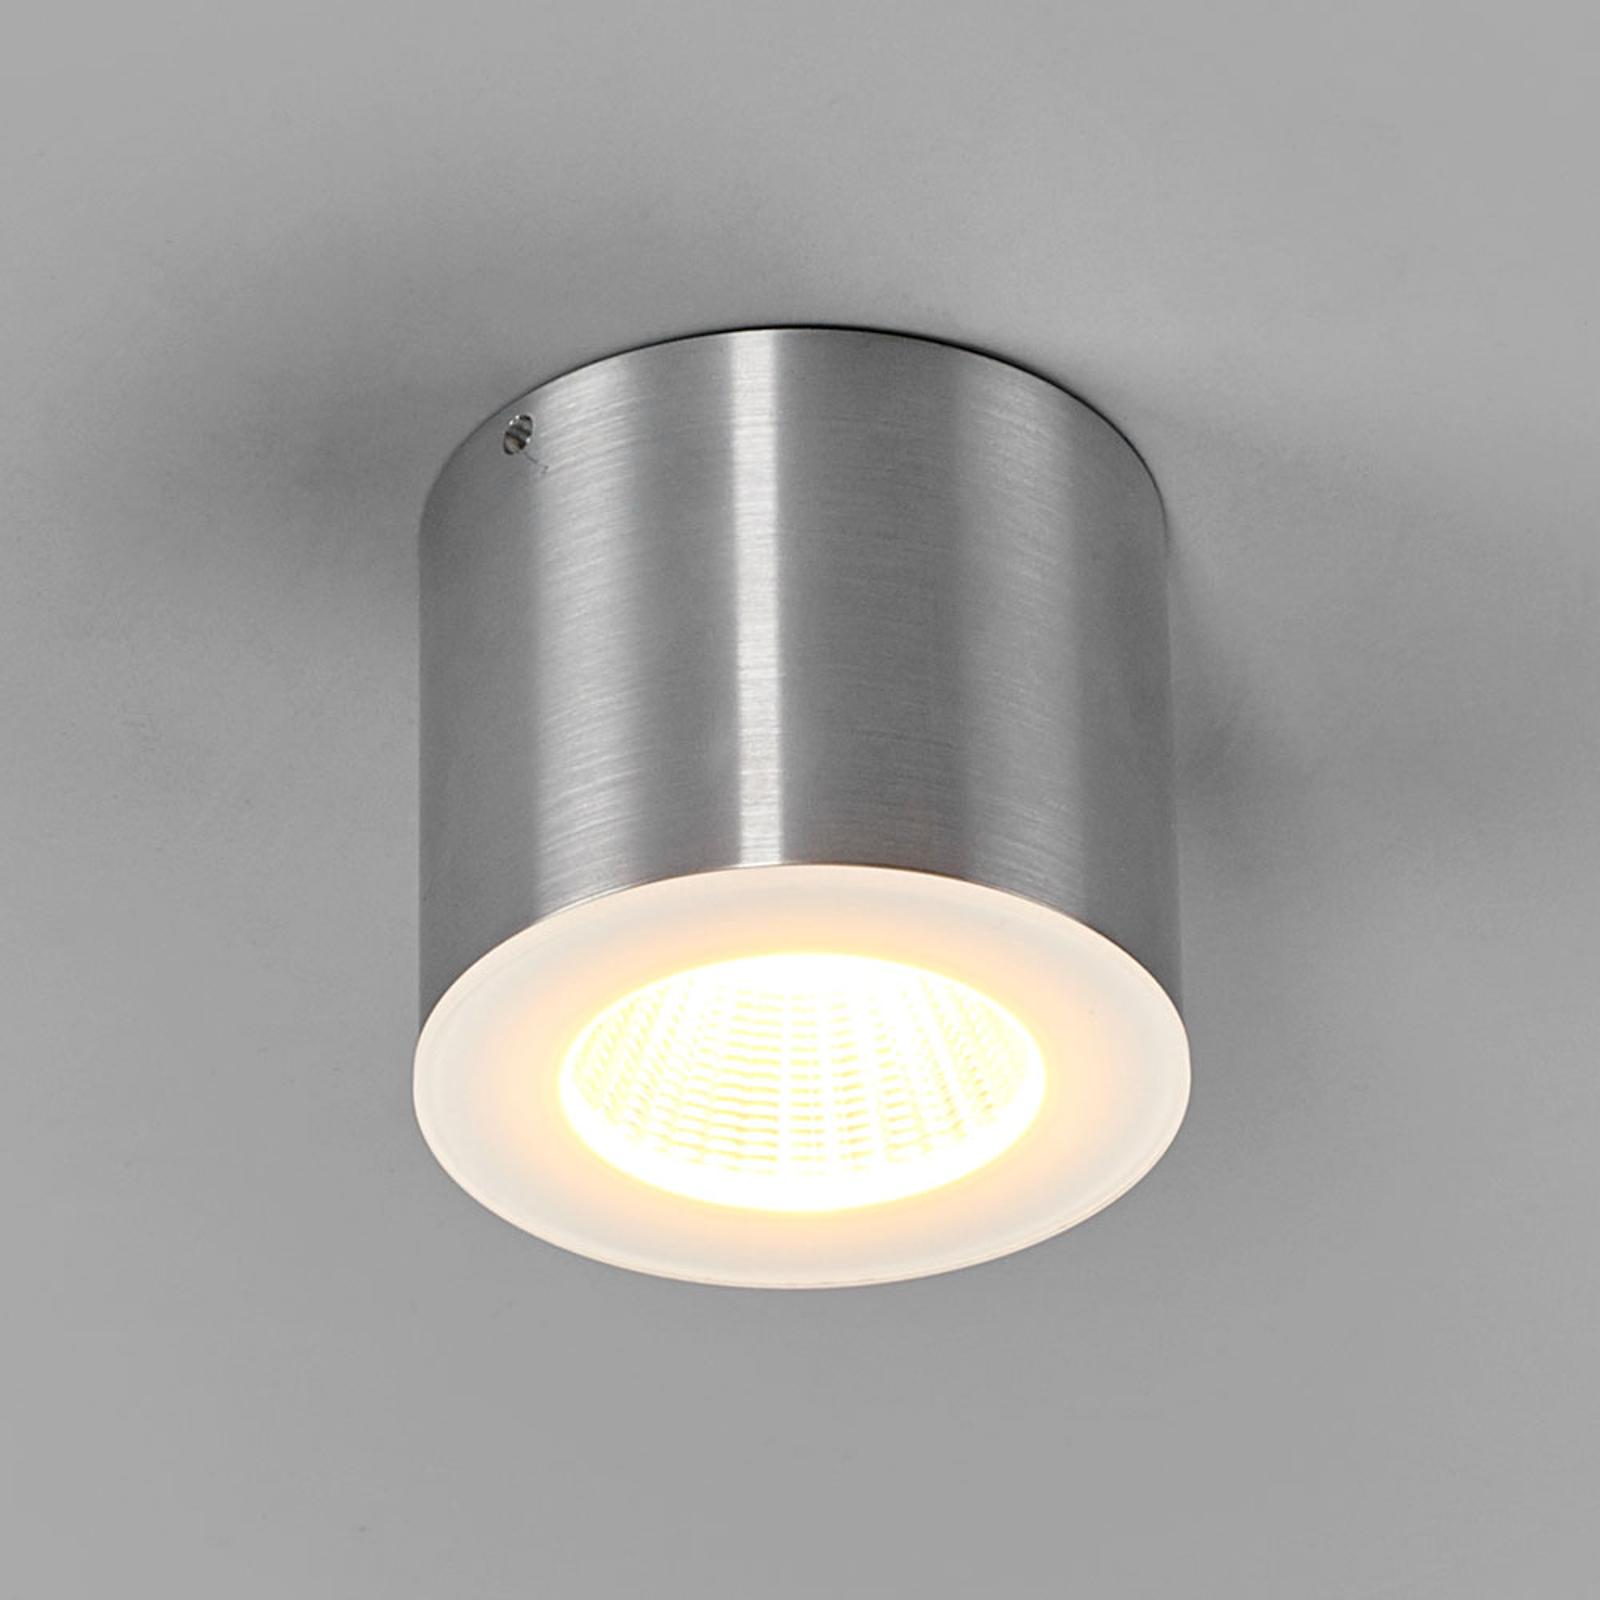 Helestra Oso LED-loftspot, rund, mat alu